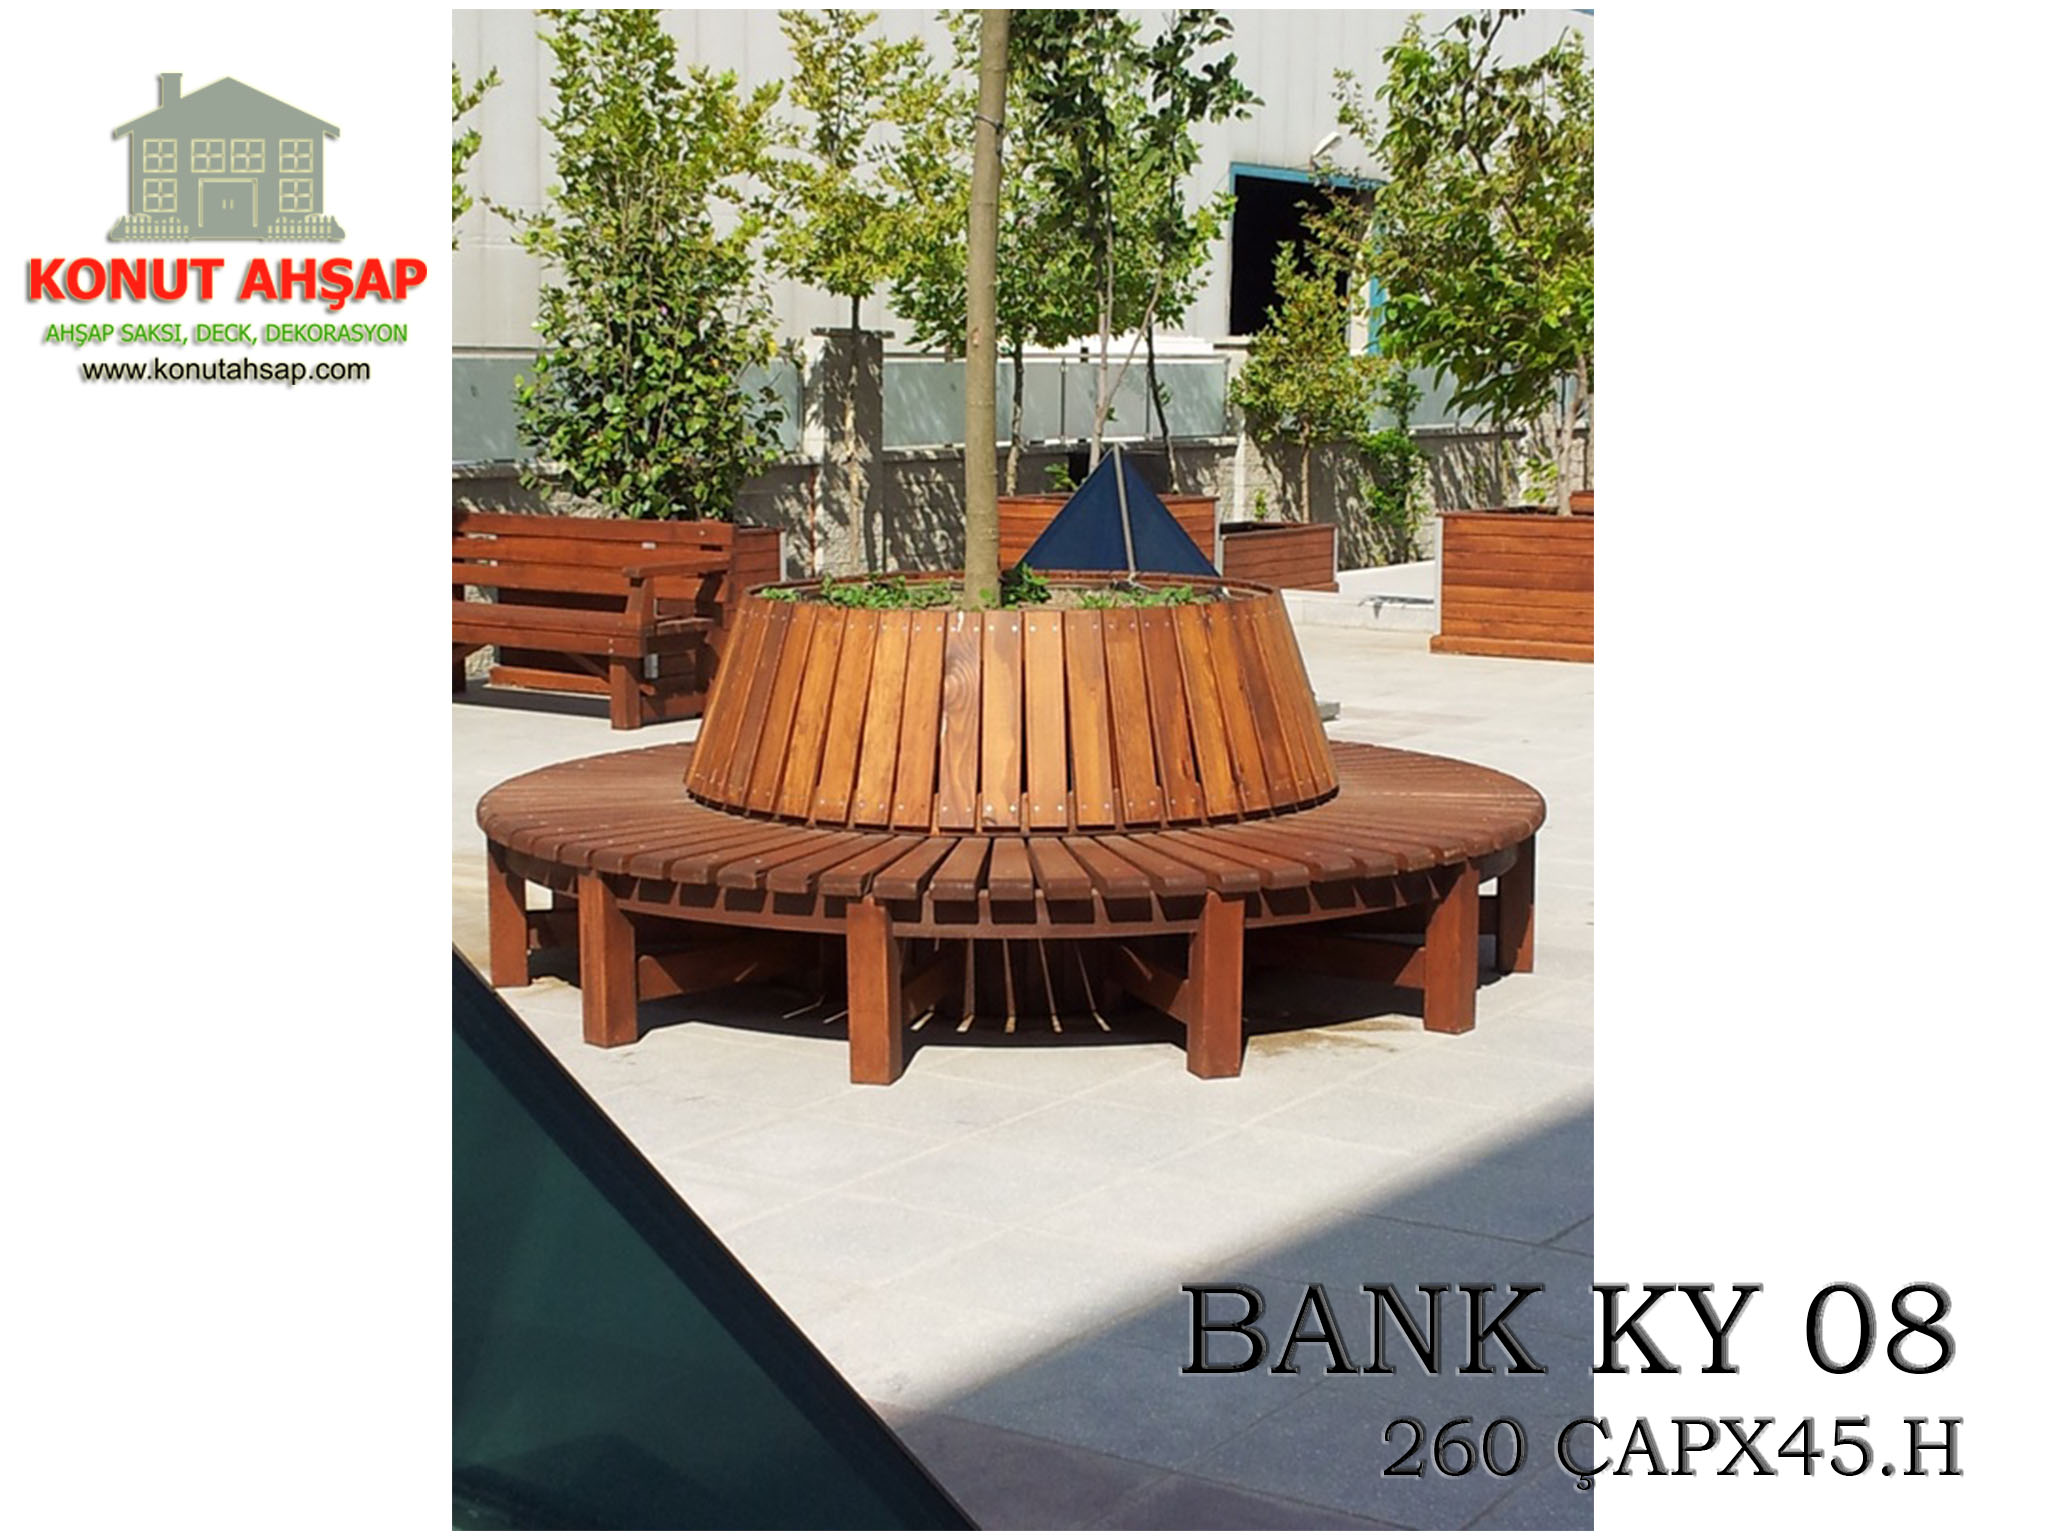 BANK KY 08